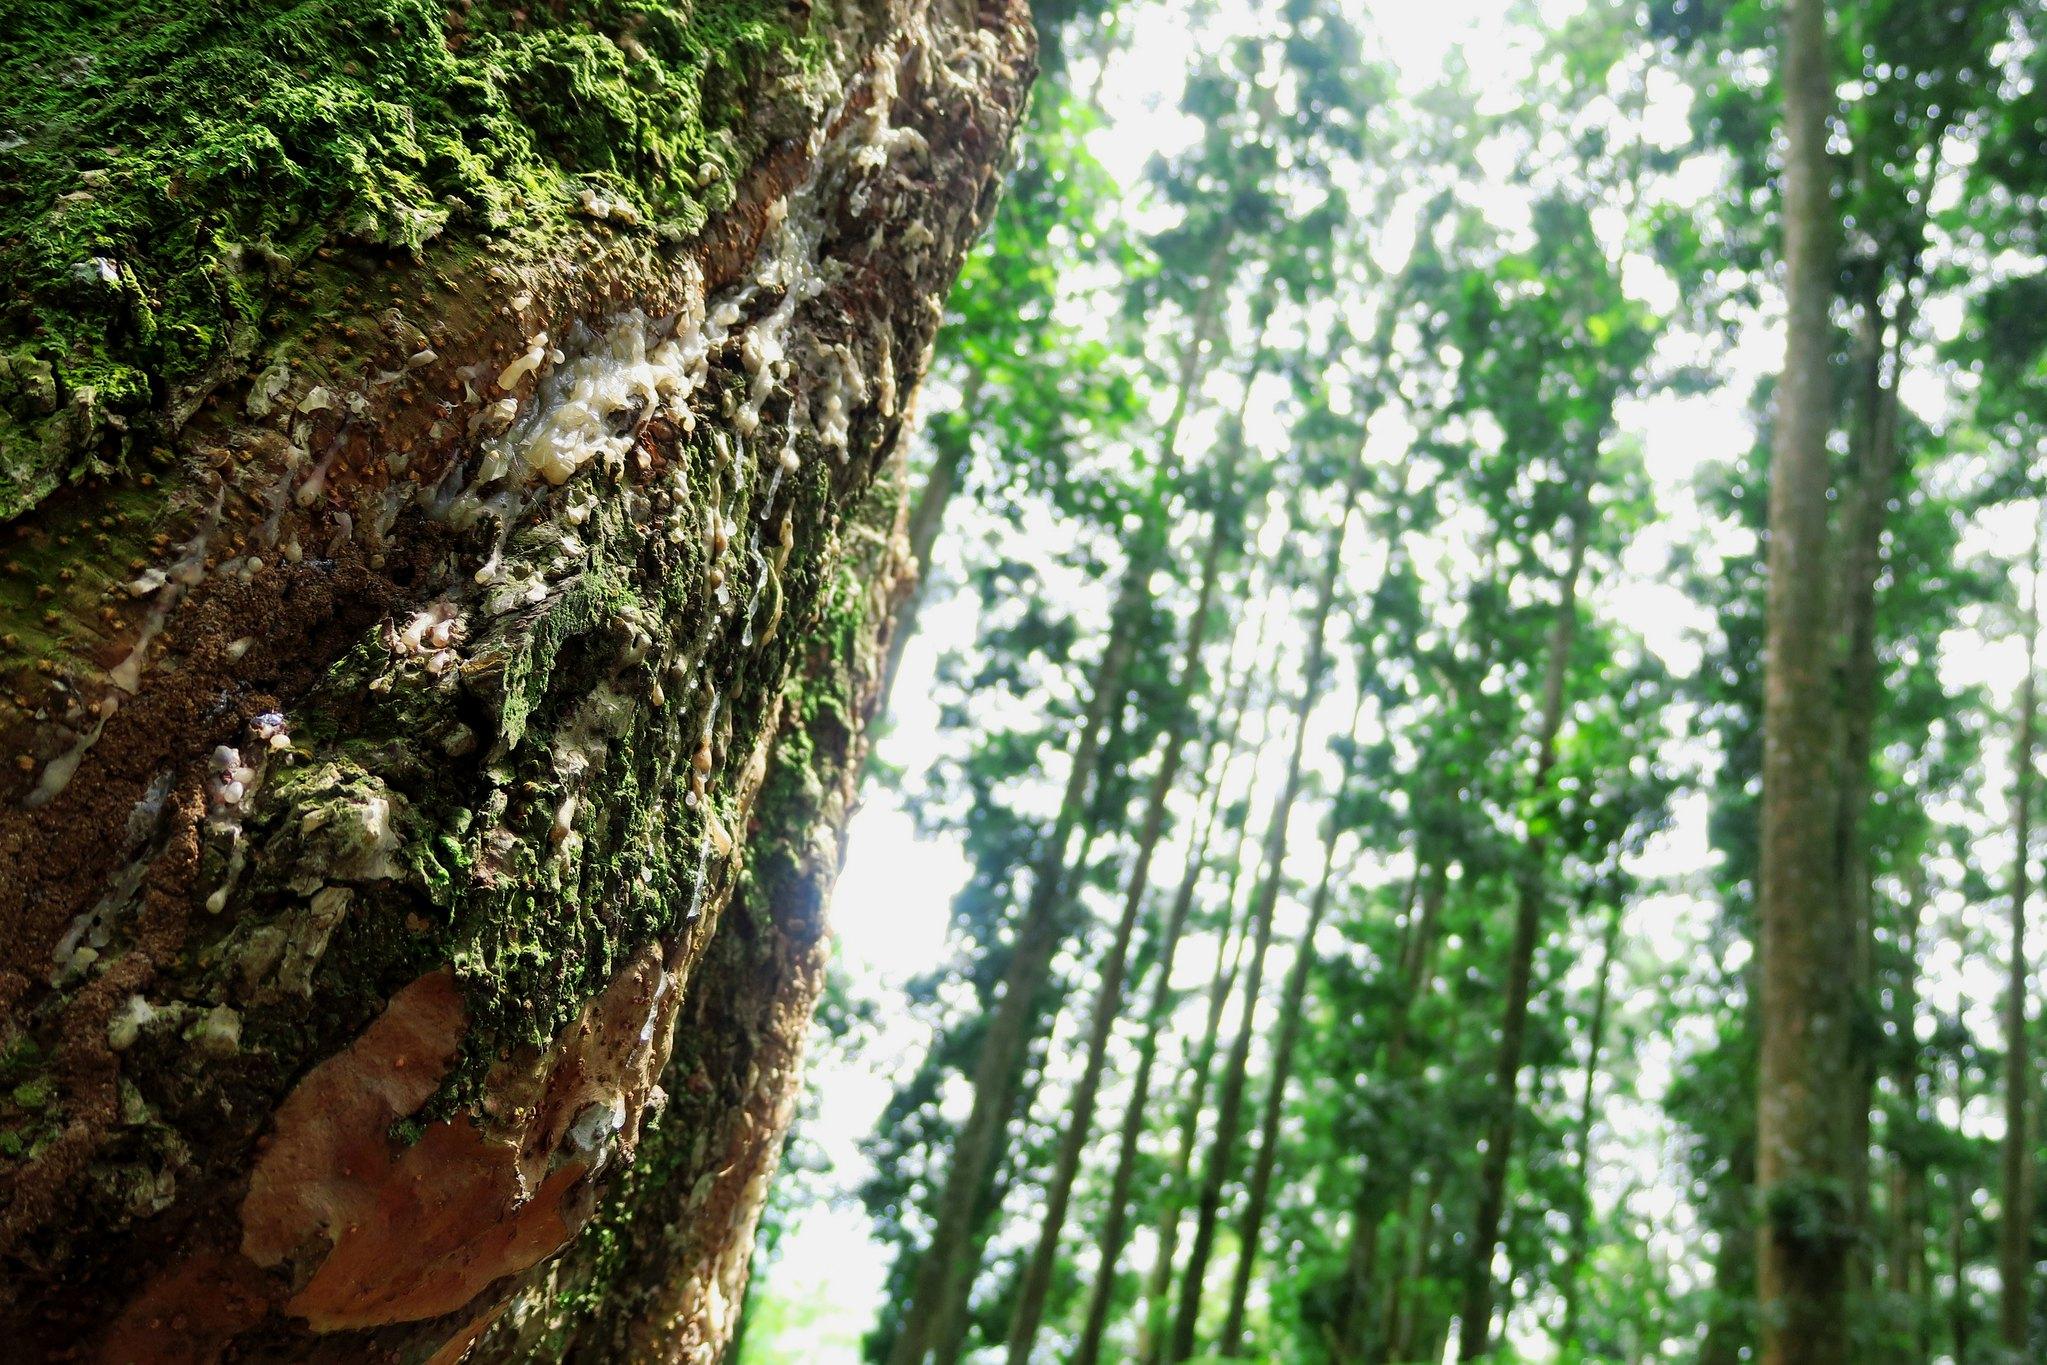 Potret pohon di hutan Indonesia | Foto: Alvianisme